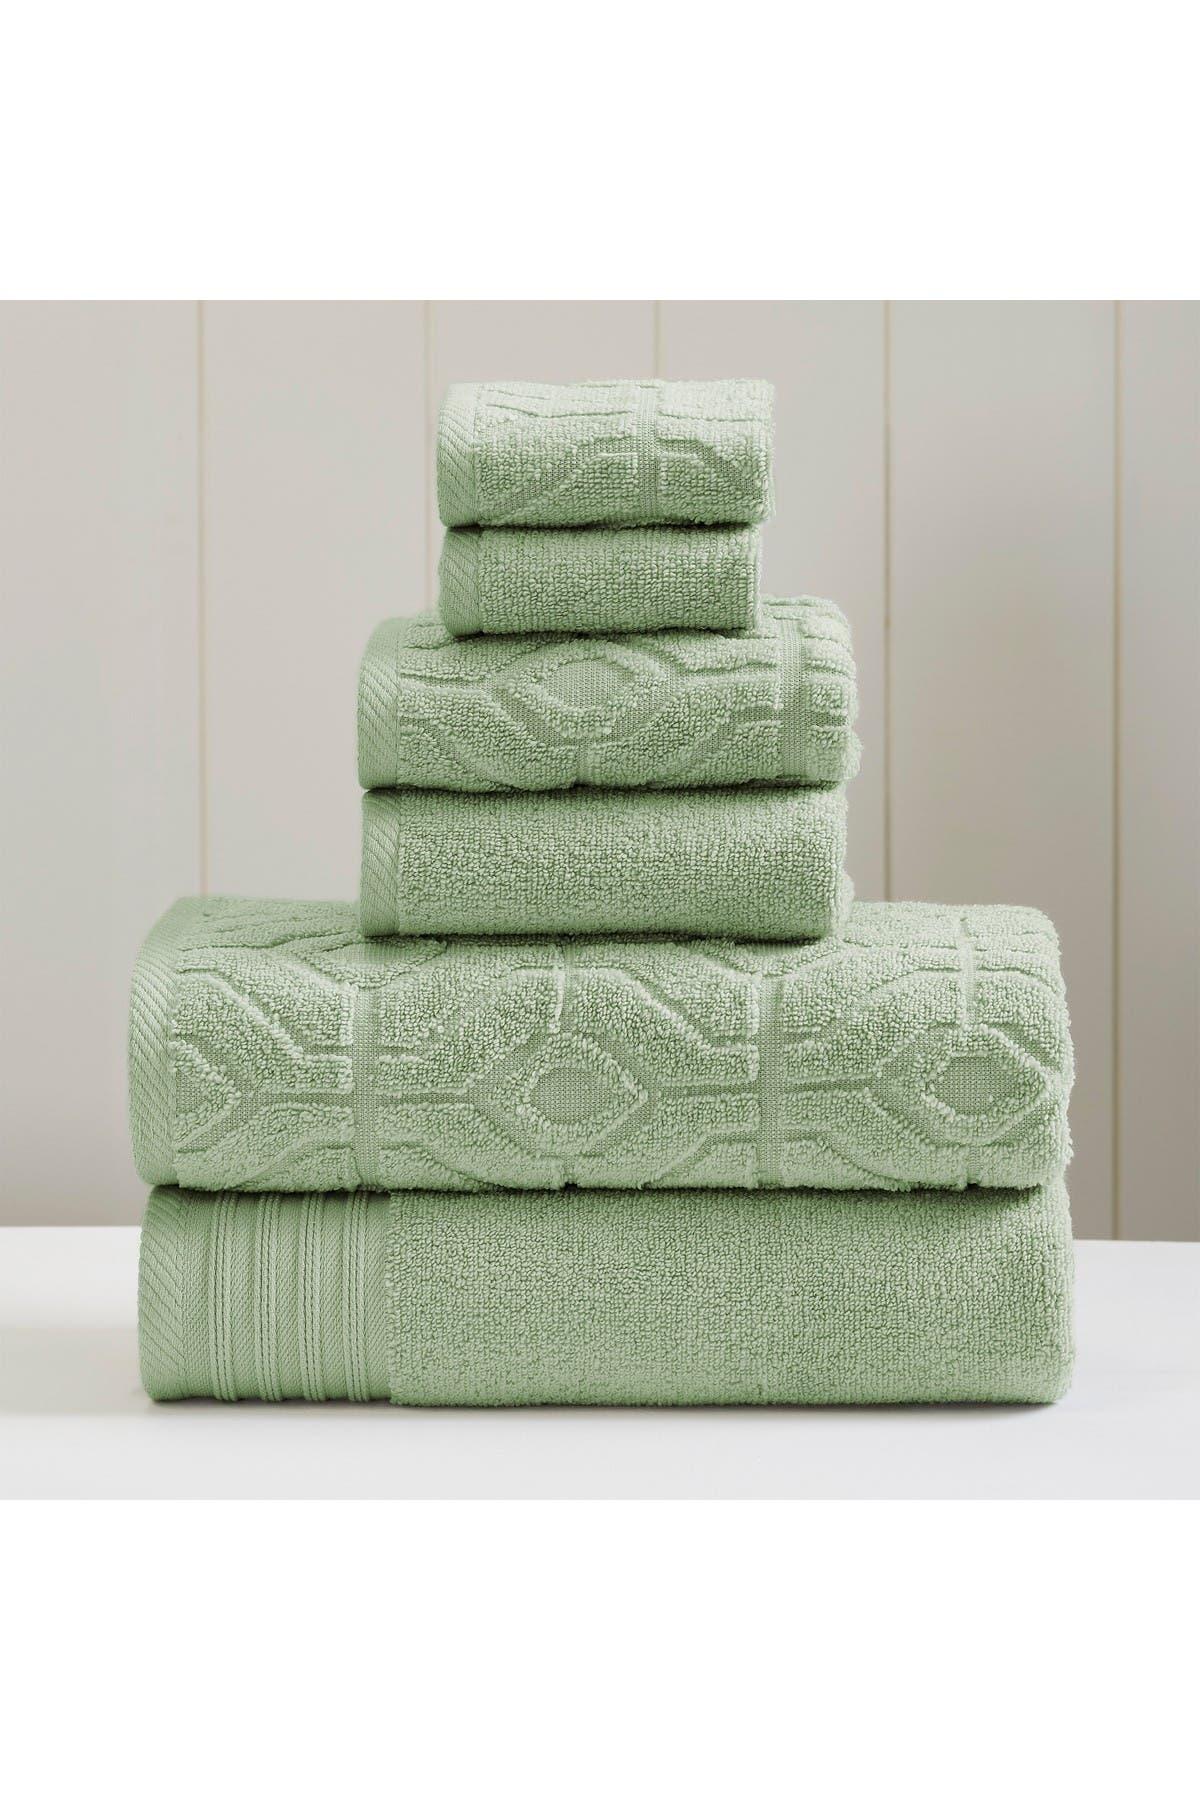 Image of Modern Threads Yarn Dyed Diamond Gate 6-Piece Towel Set - Sea Foam Green